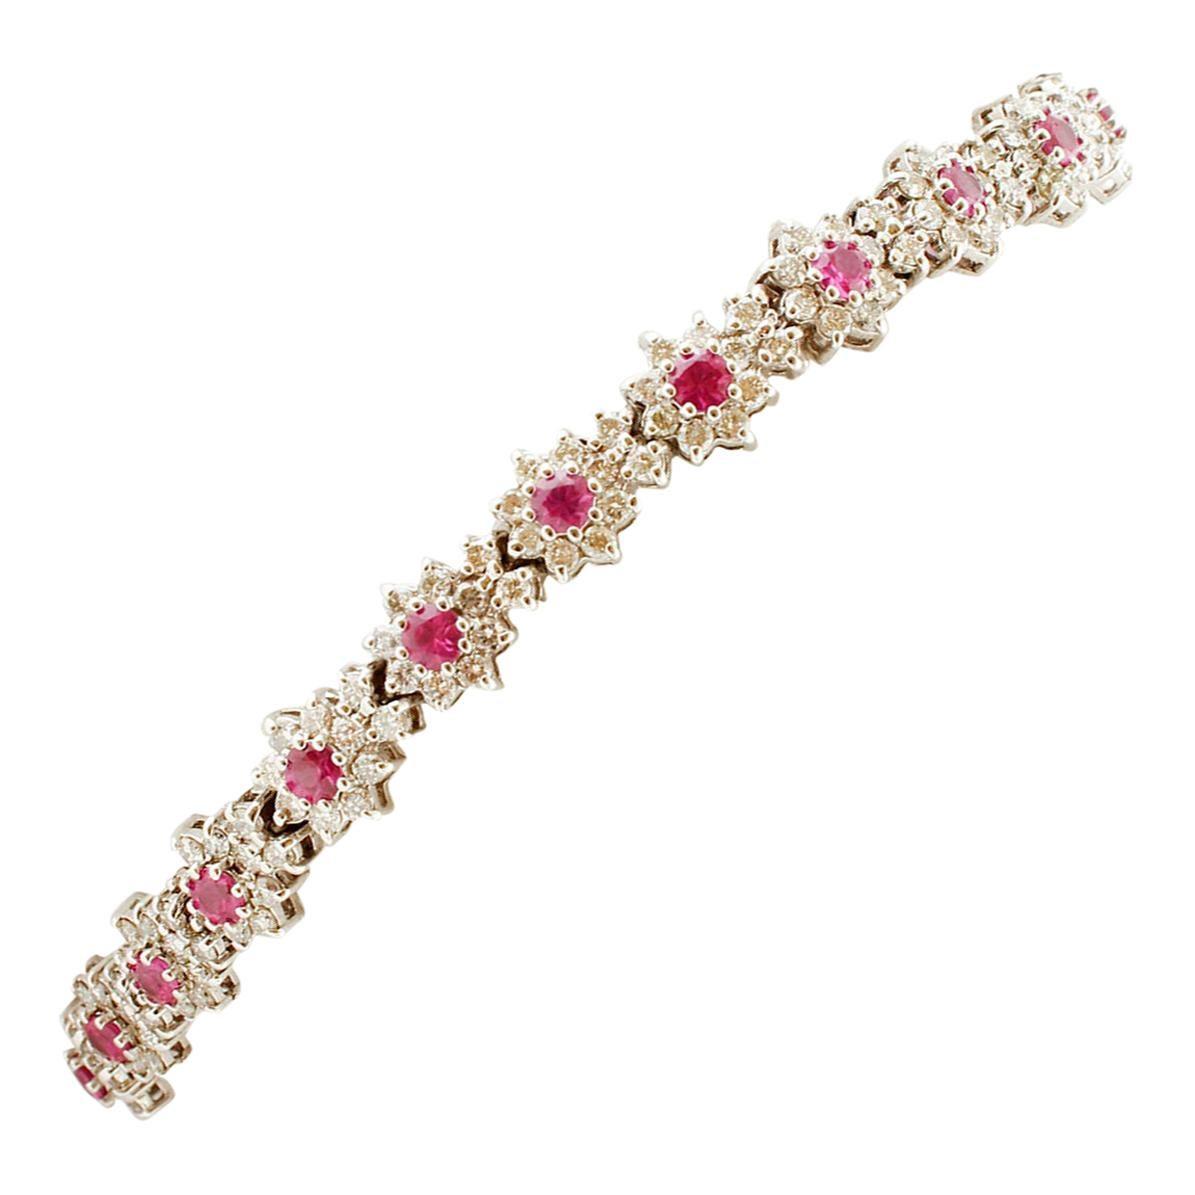 Diamonds and Rubies, White Gold Link Bracelet